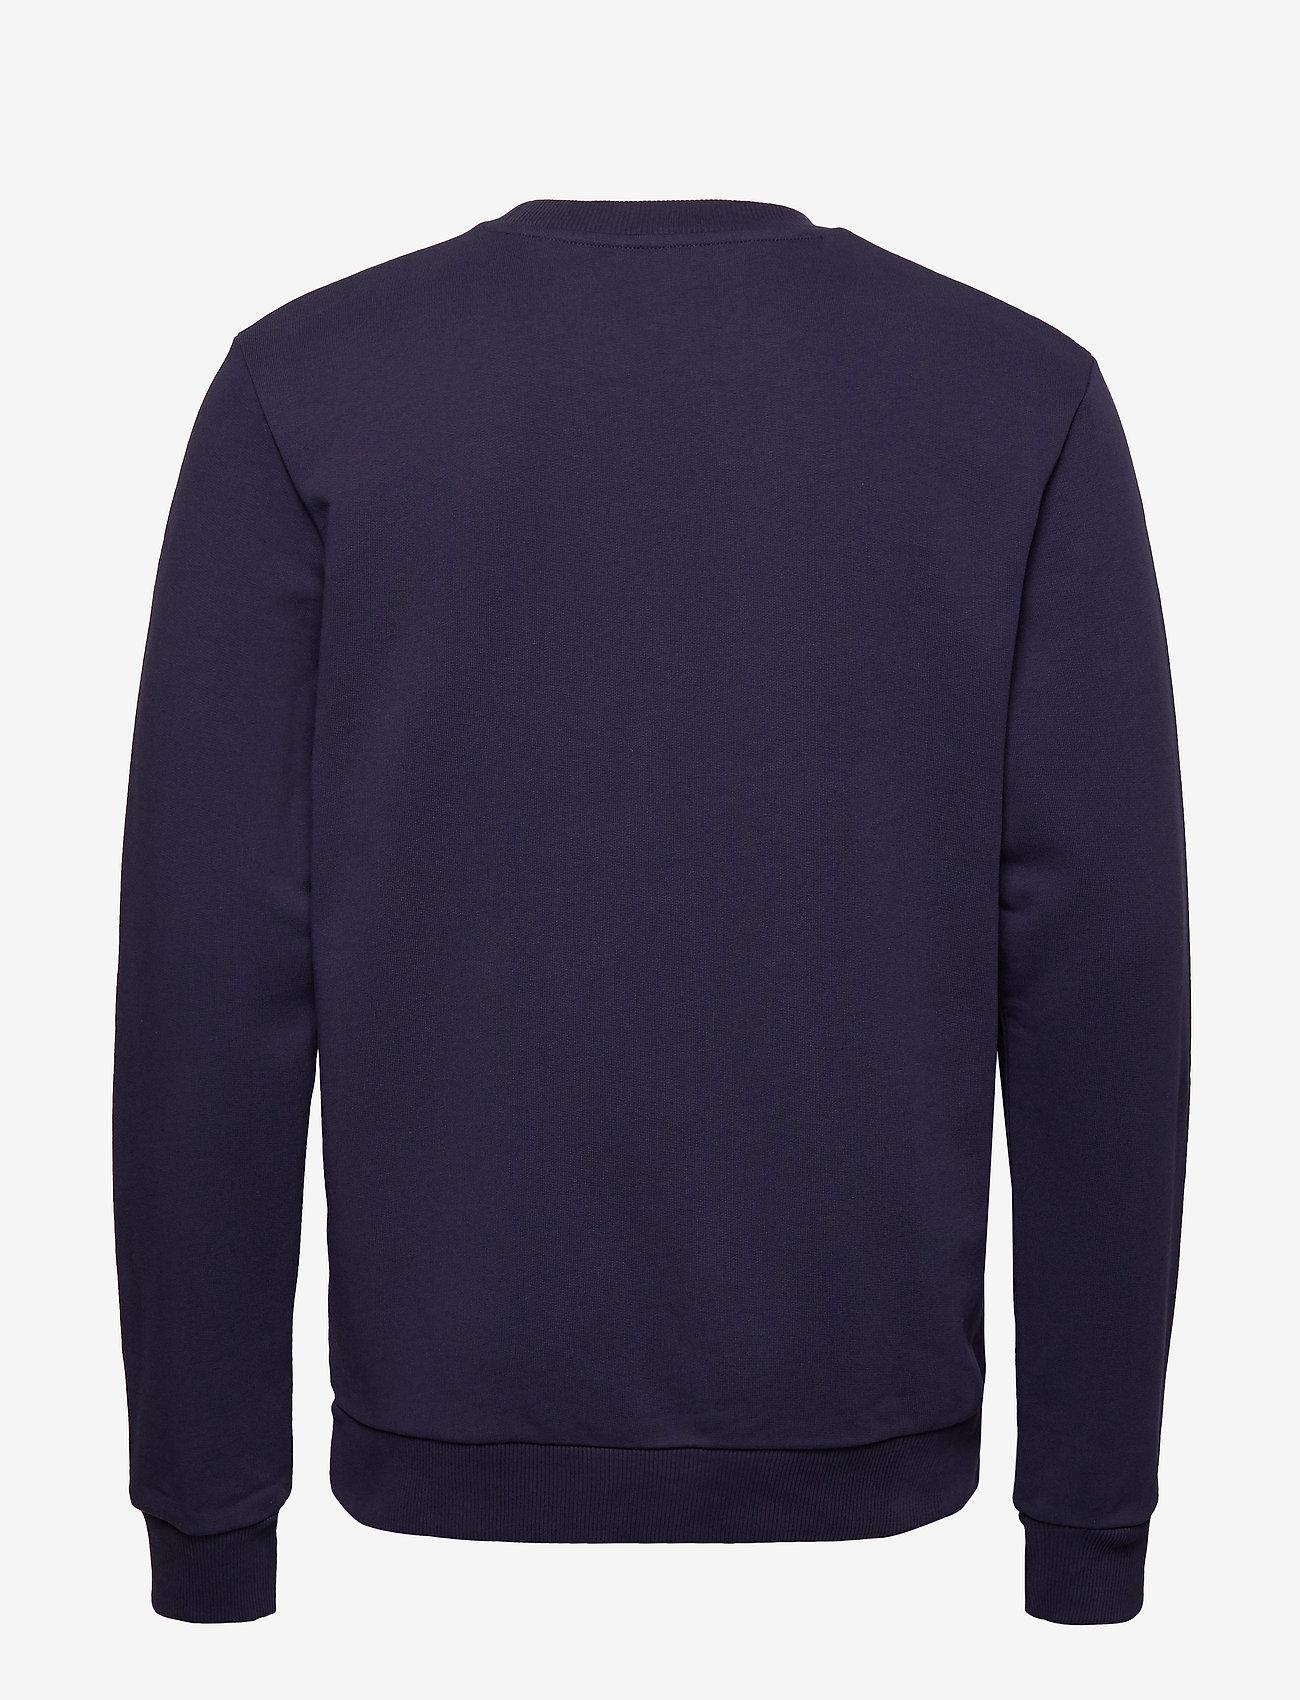 Frank Dandy - Unisex Solid Crew - basic sweatshirts - dark navy - 1